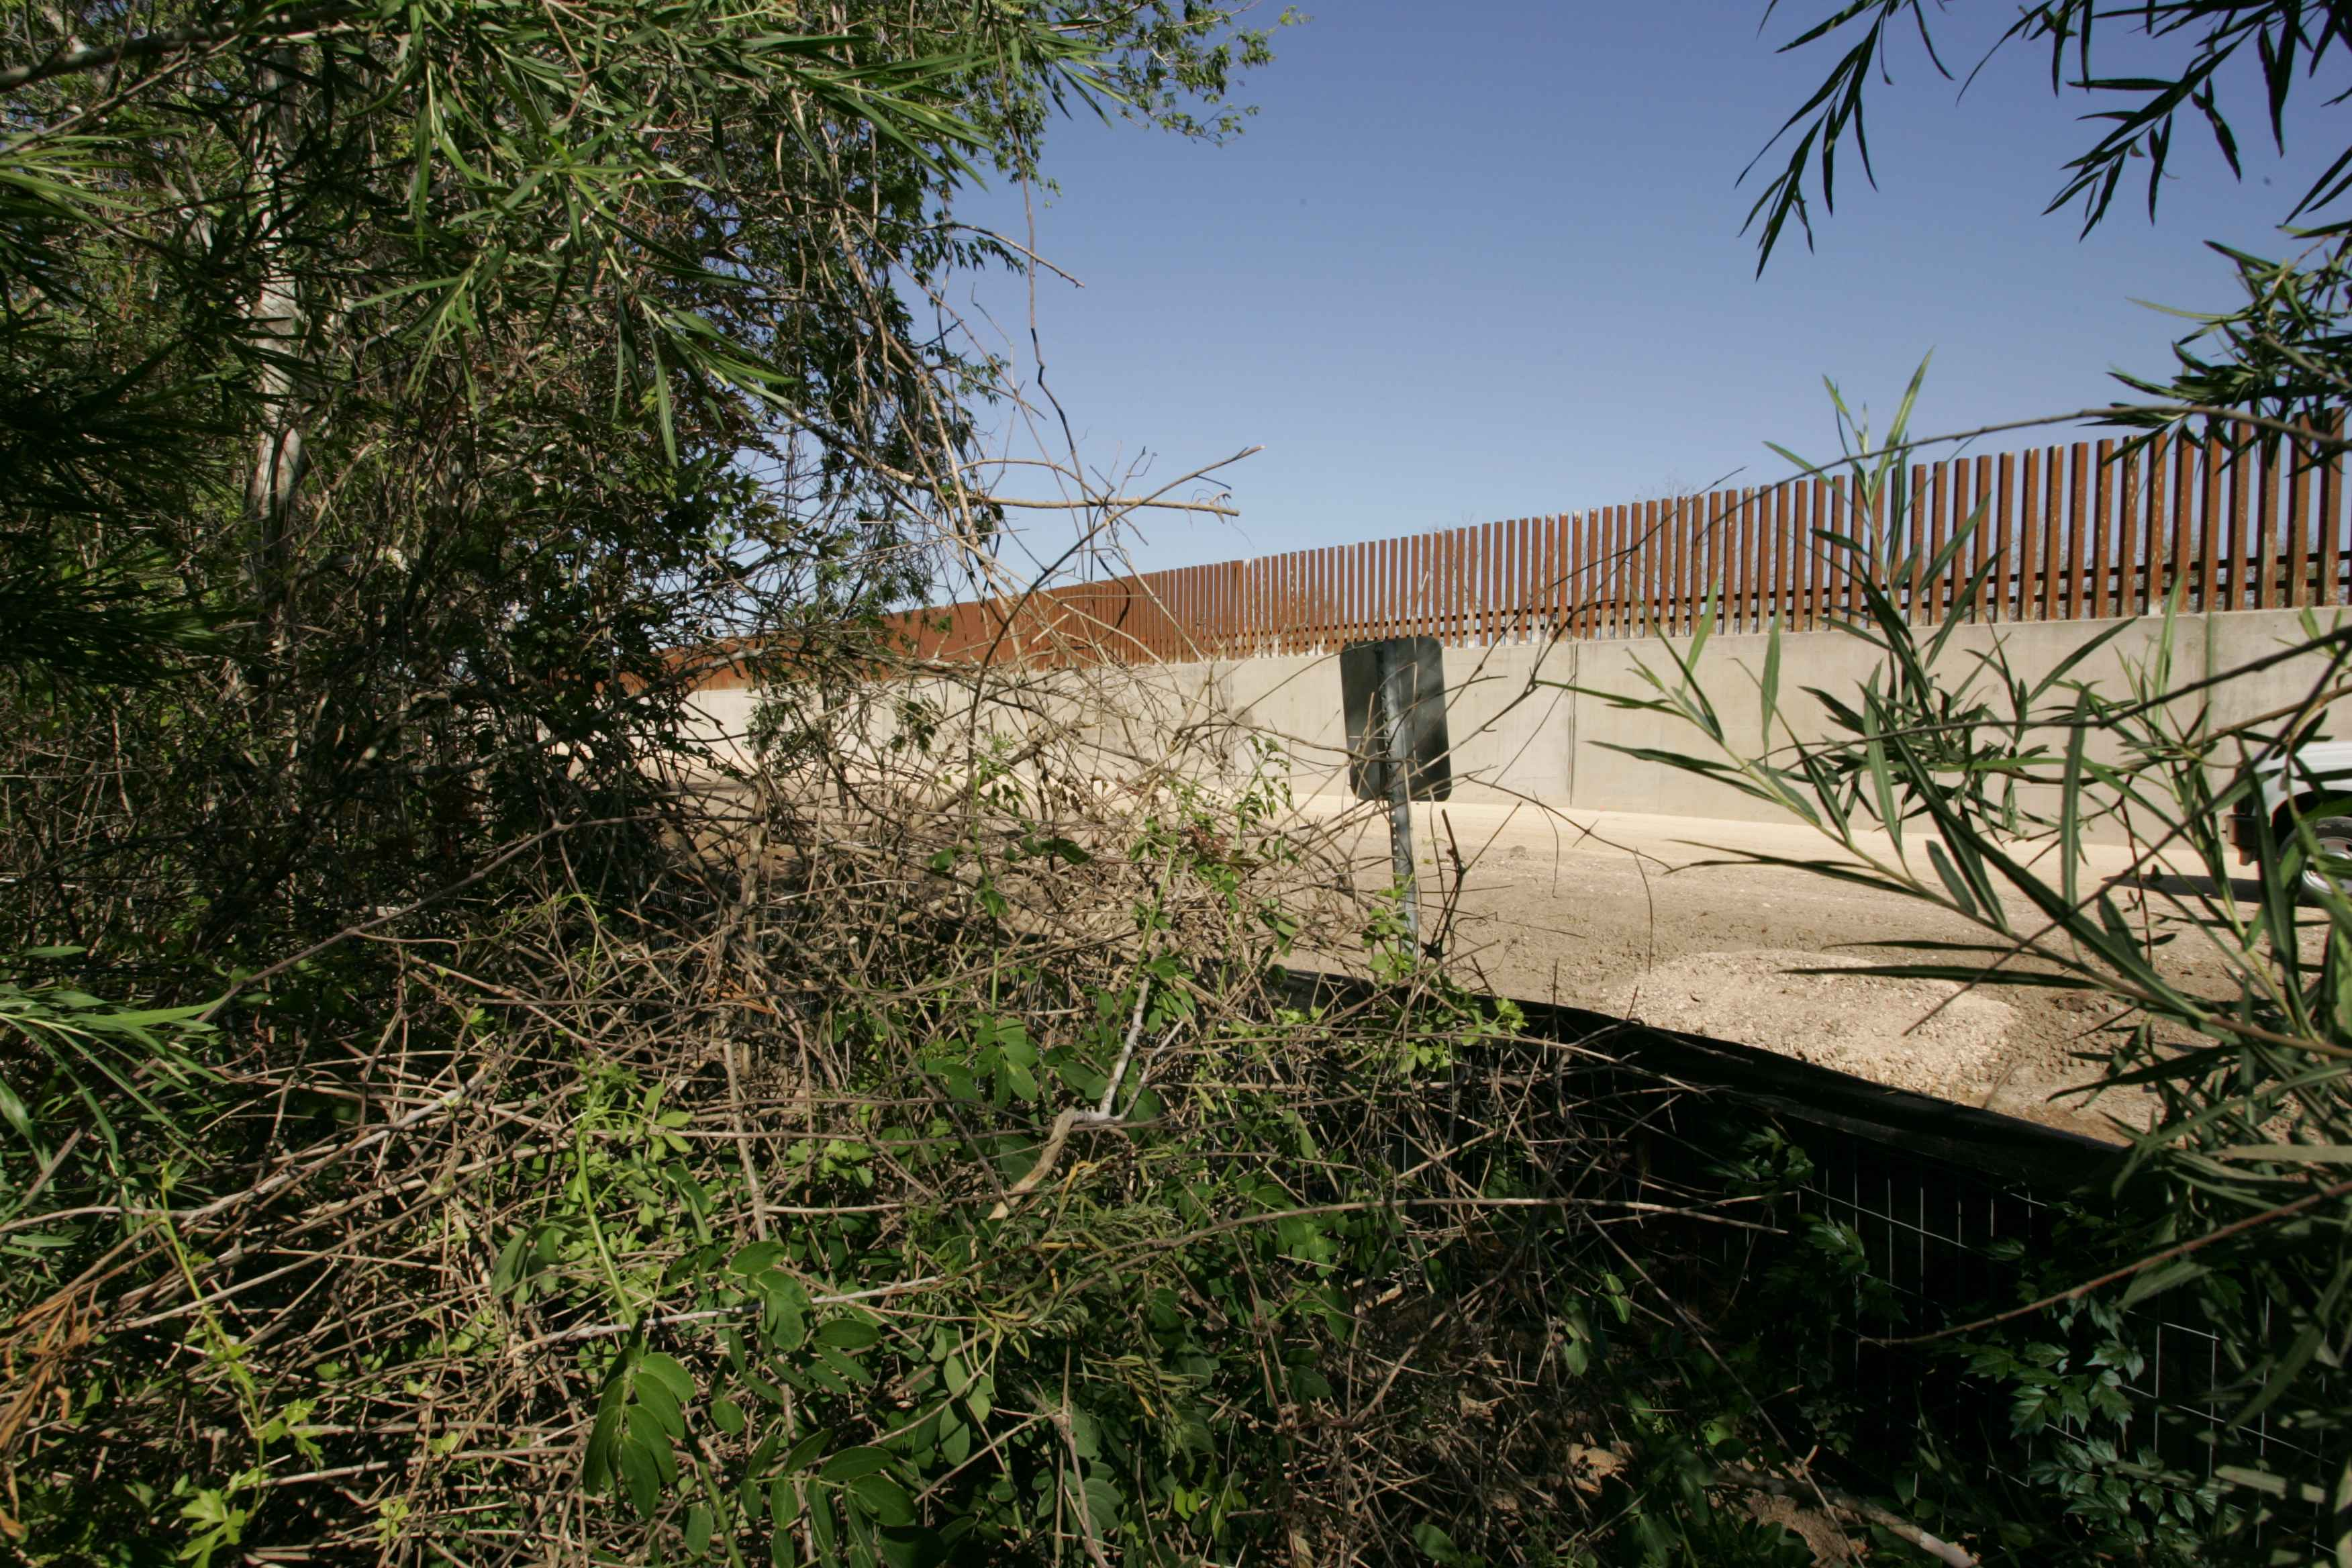 FileConcrete border walljpg Wikimedia Commons